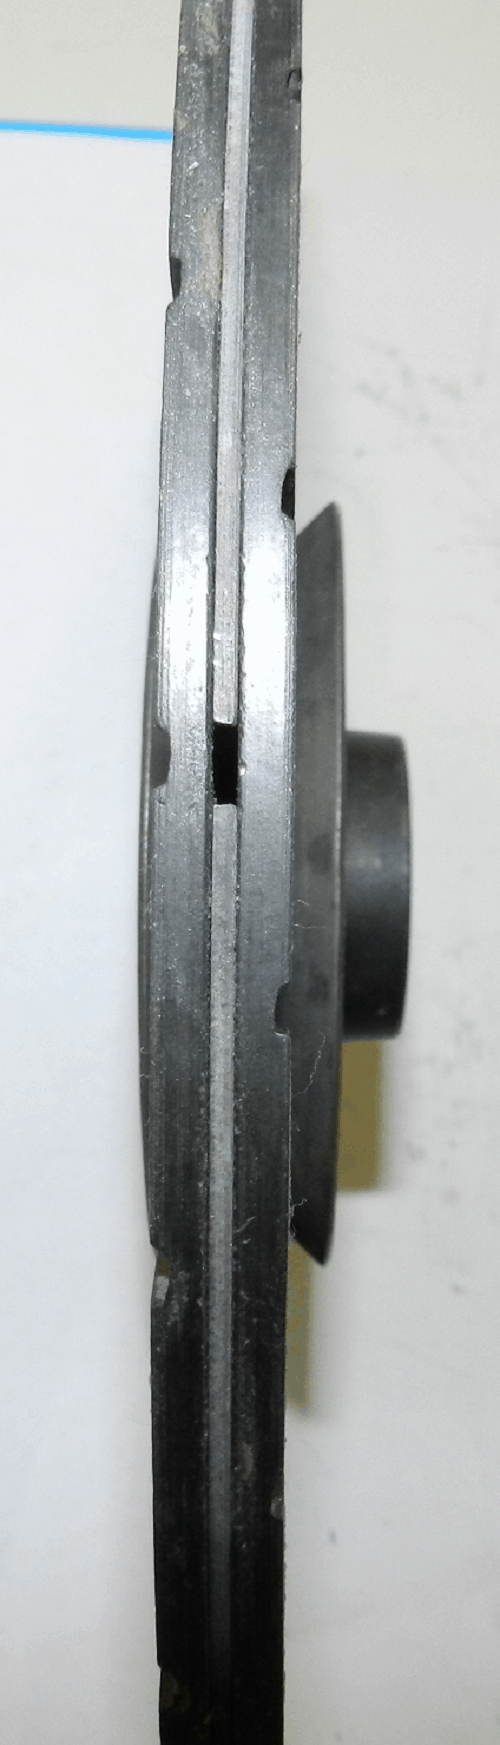 Disco Frizione 250x10x29 - T2510290